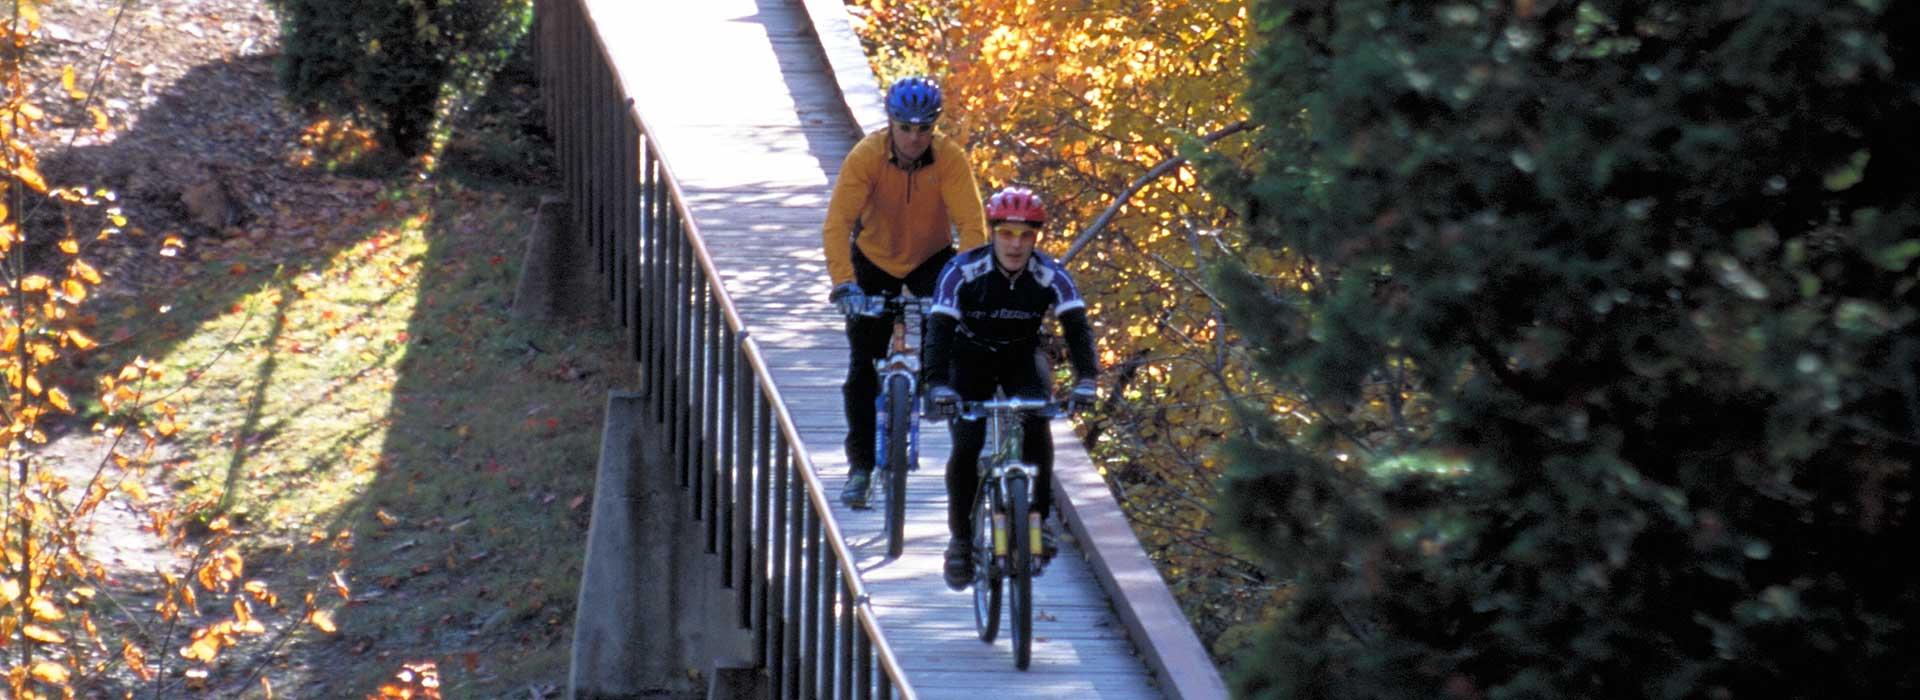 mountain-bike-cycle-header